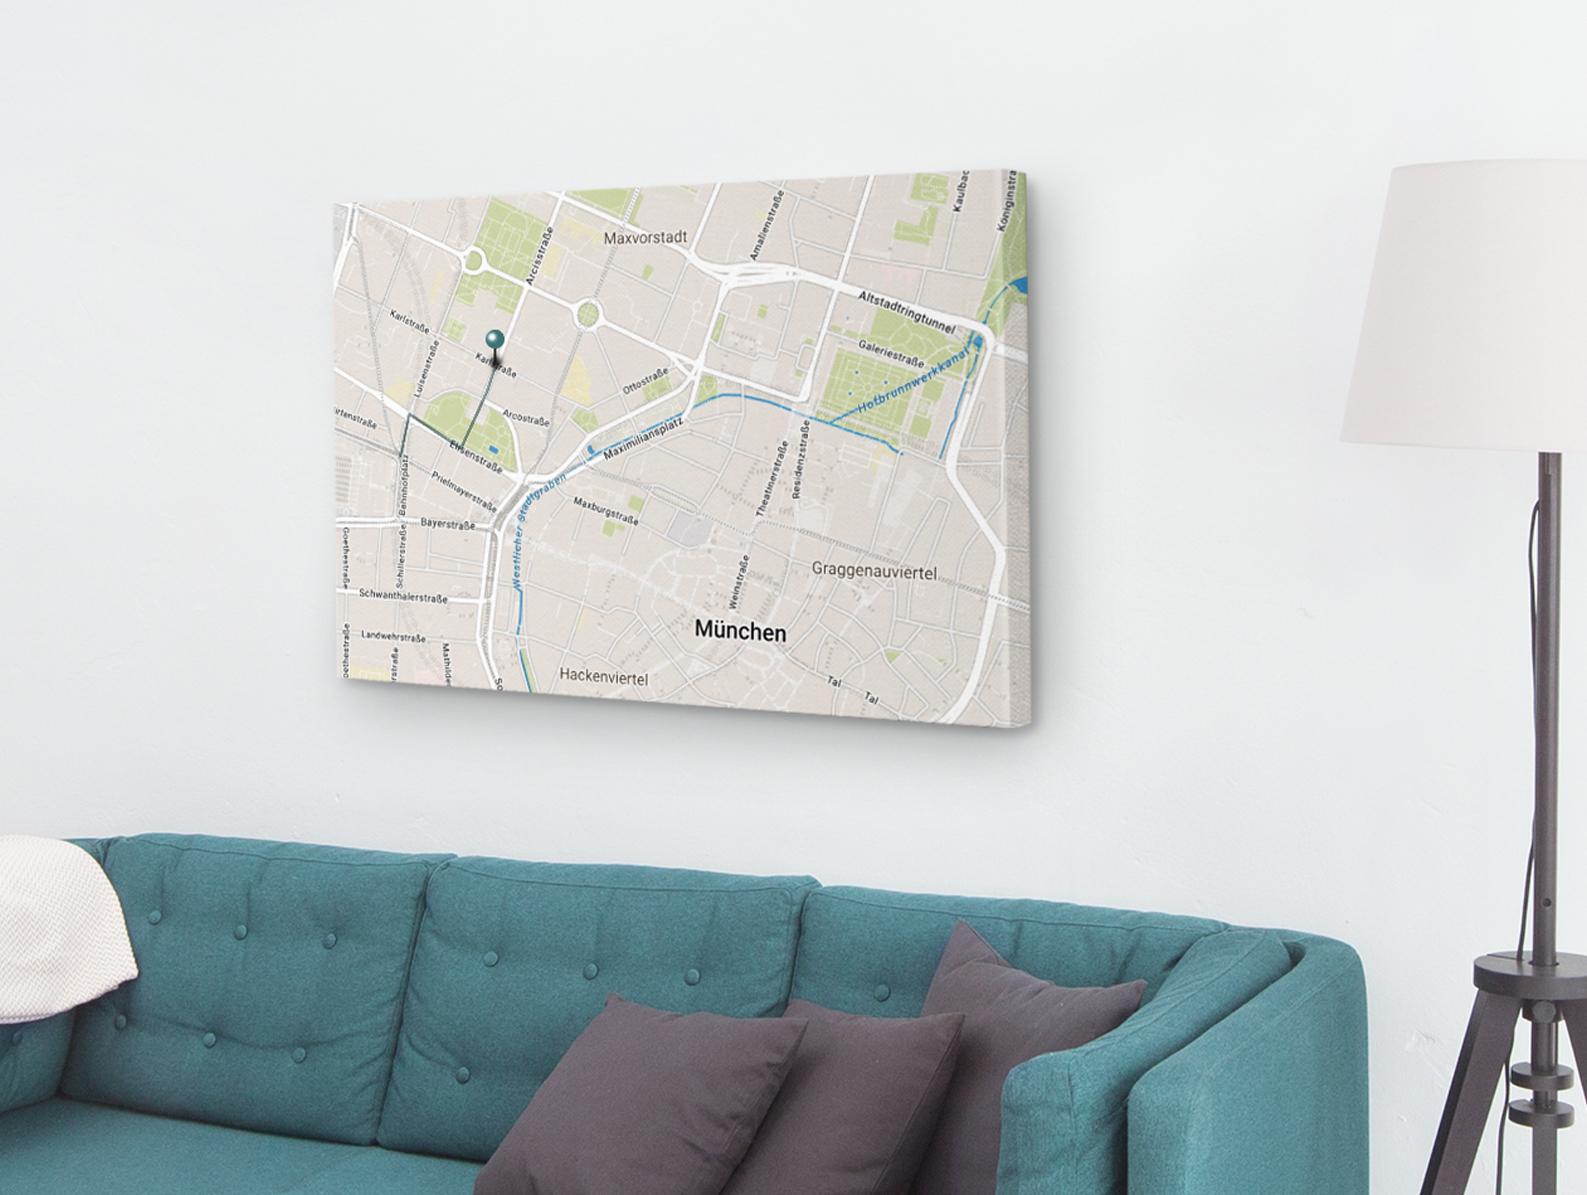 Karten drucken lassen mit OpenStreetMap